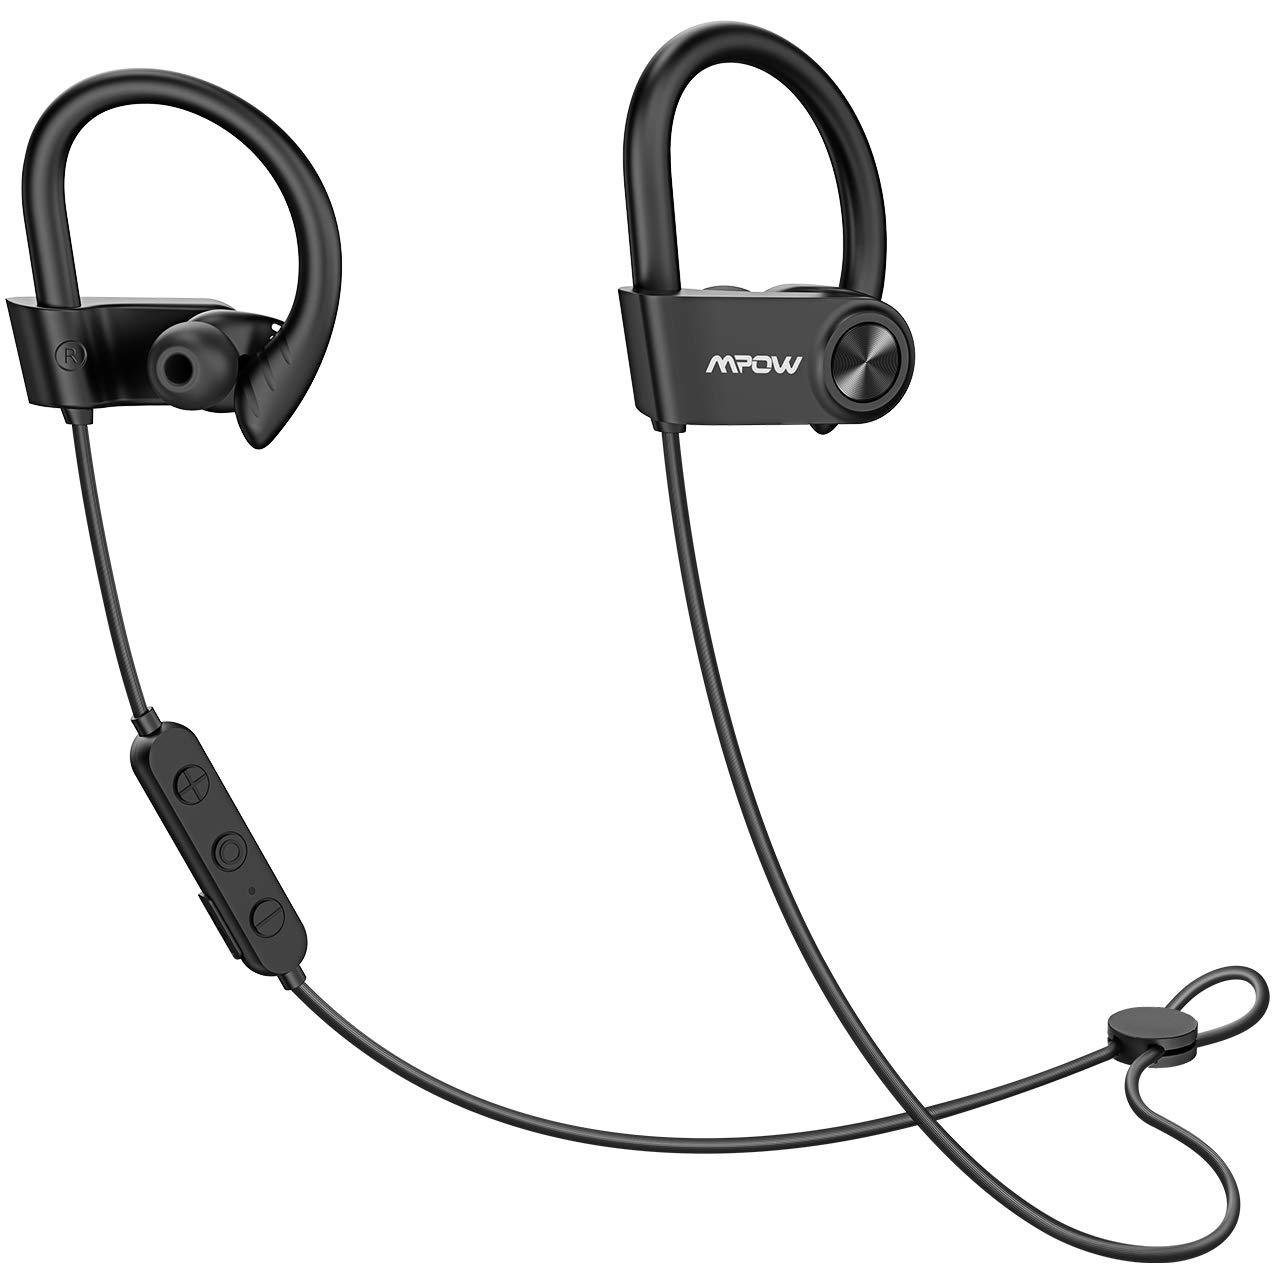 Mpow D9 Bluetooth Headphones Sport,16H Playtime IPX7 Waterproof Wireless Headphones Sport Earbuds W aptX Bass Stereo, Running Headphones Bluetooth Earphones W CVC 6.0 Noise Cancelling Mic, Black